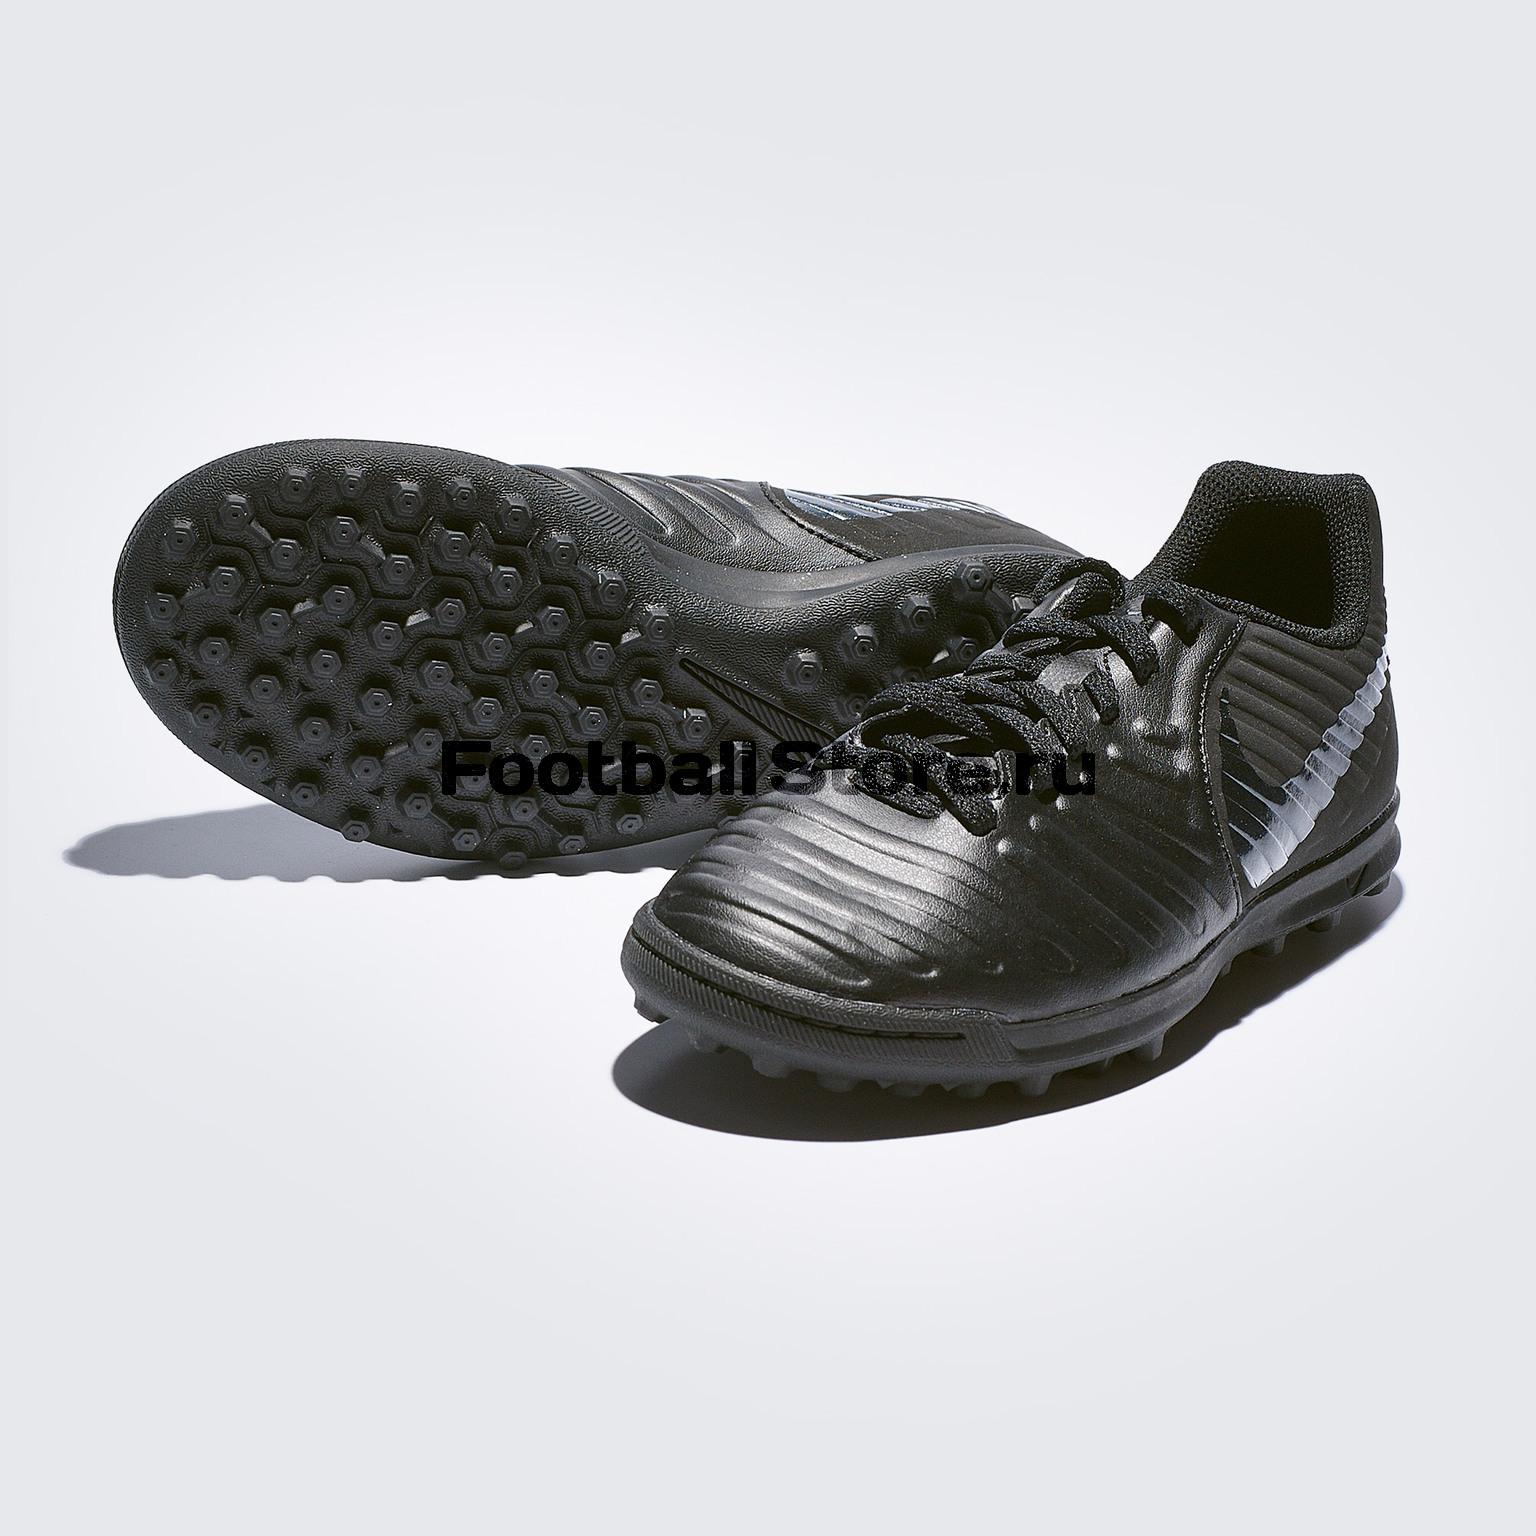 Шиповки детские Nike LegendX Club TF AH7261-001 стельки nike